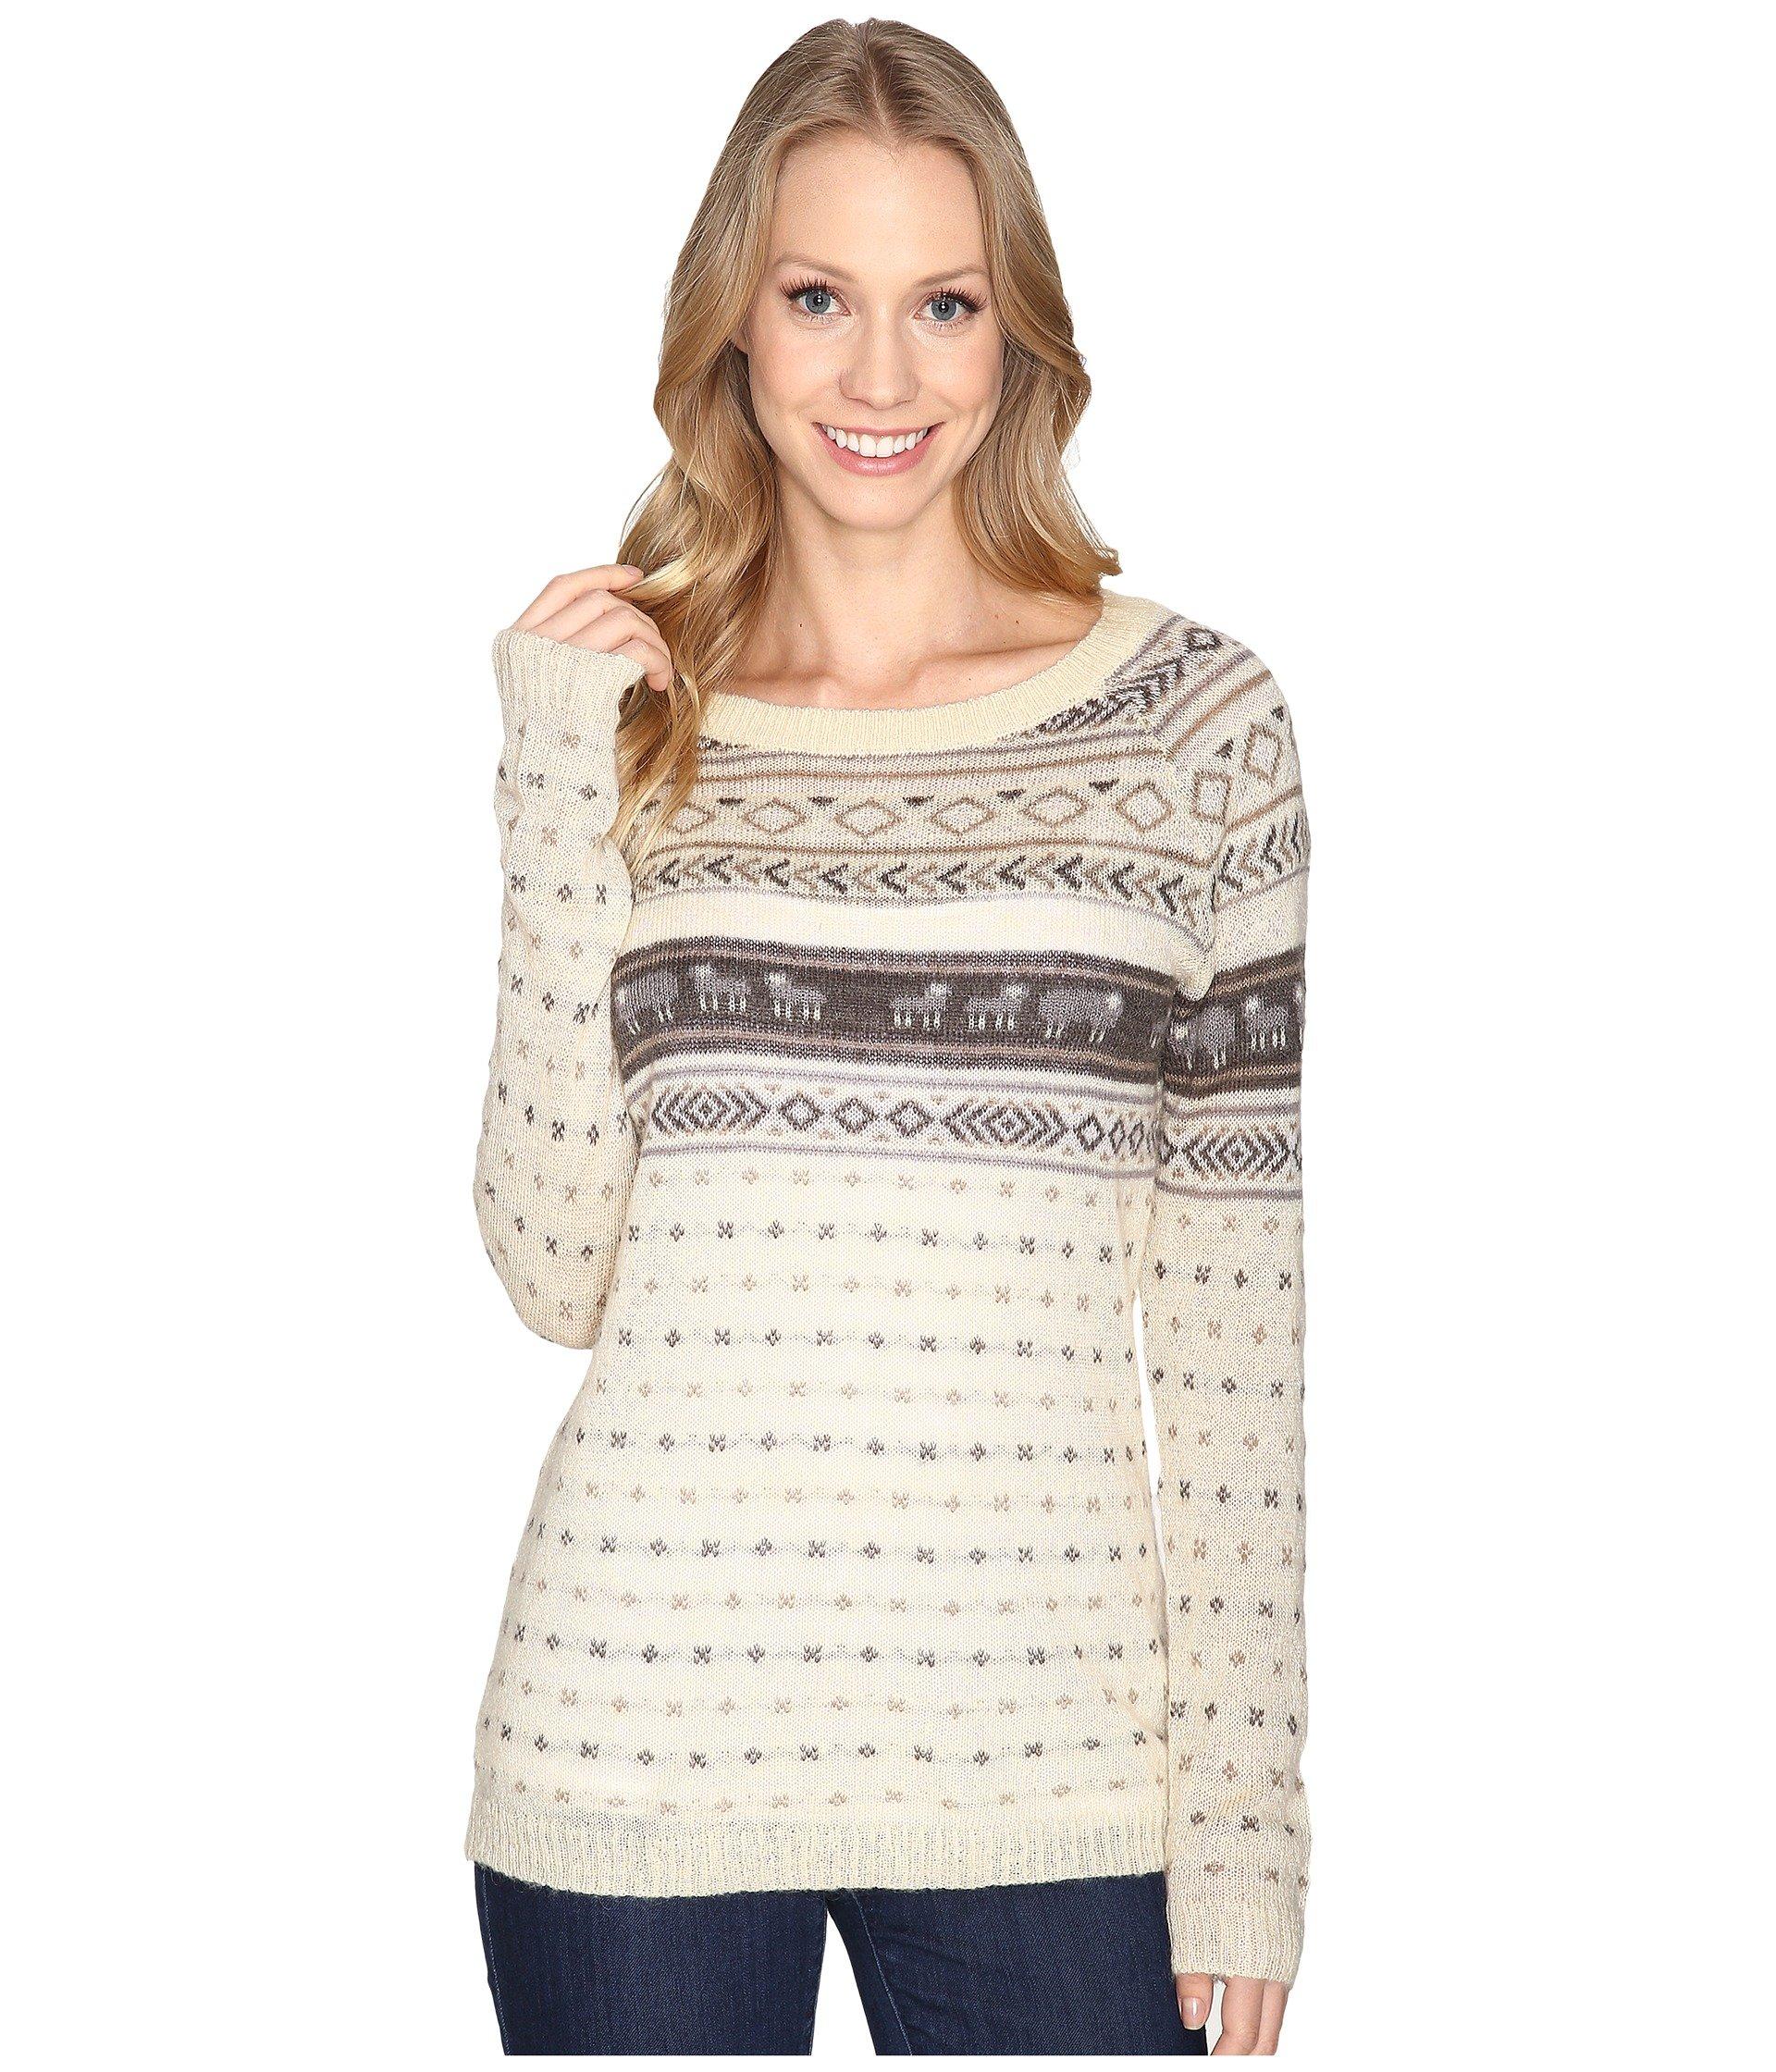 Saco para Mujer Woolrich Mohair Fairisle II Sweater  + Woolrich en VeoyCompro.net